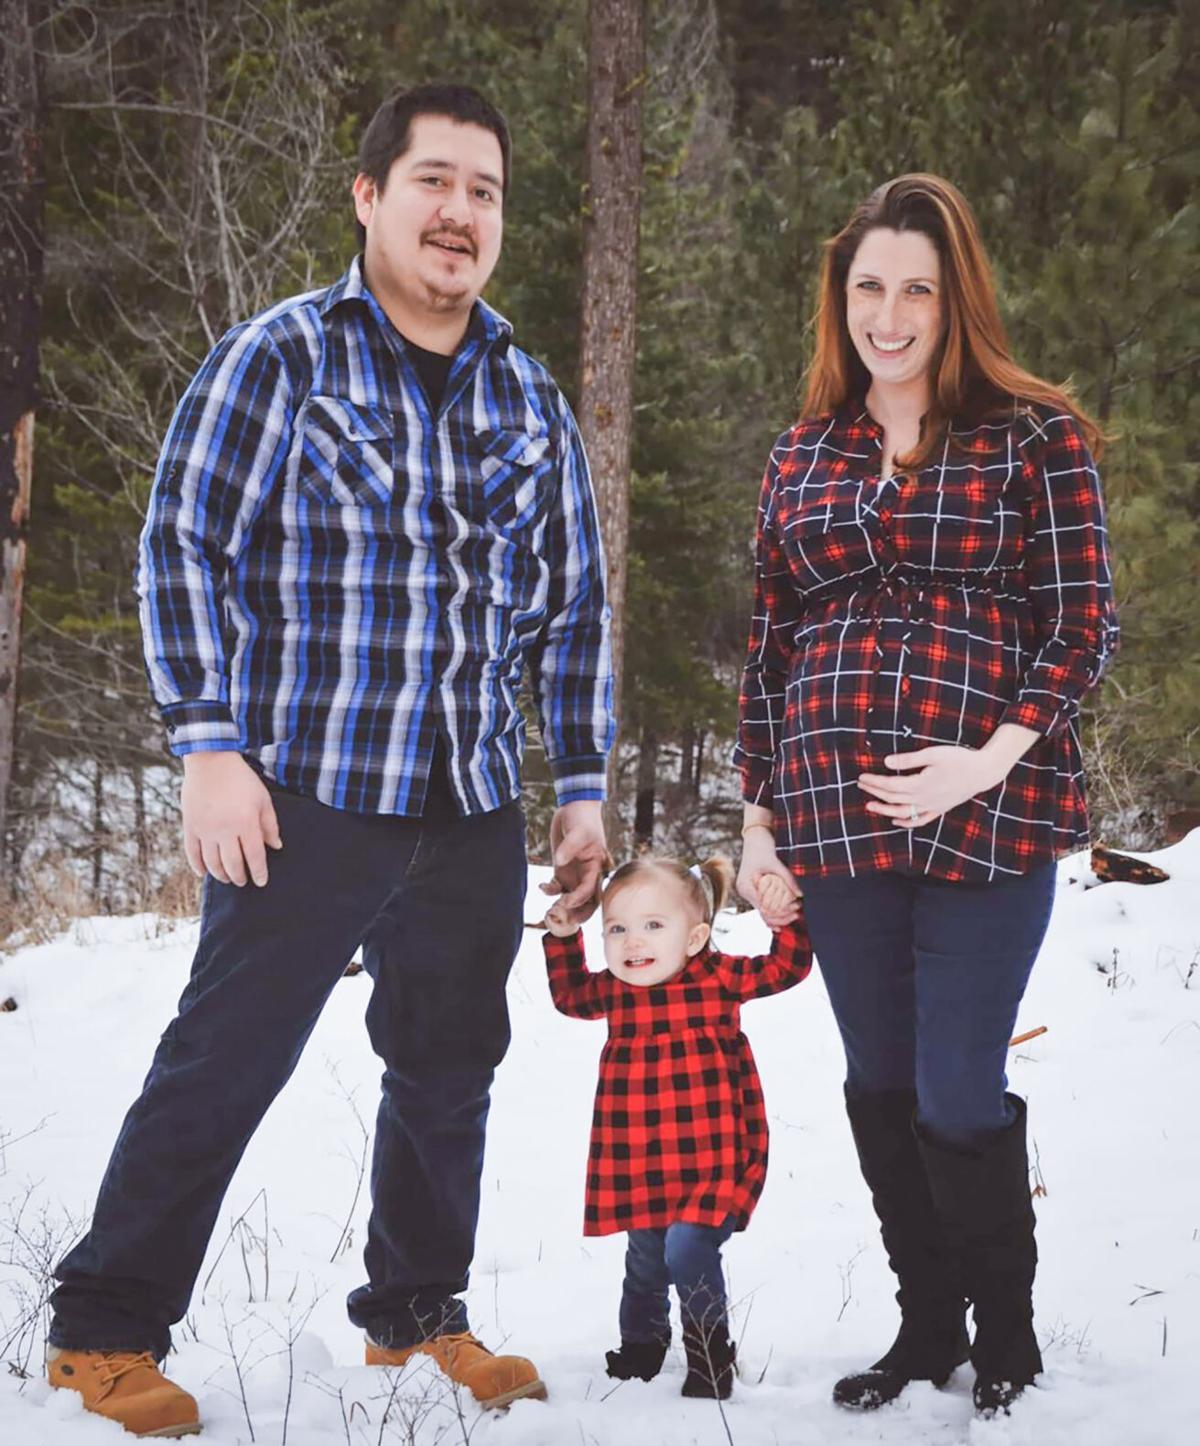 Whittle family photo